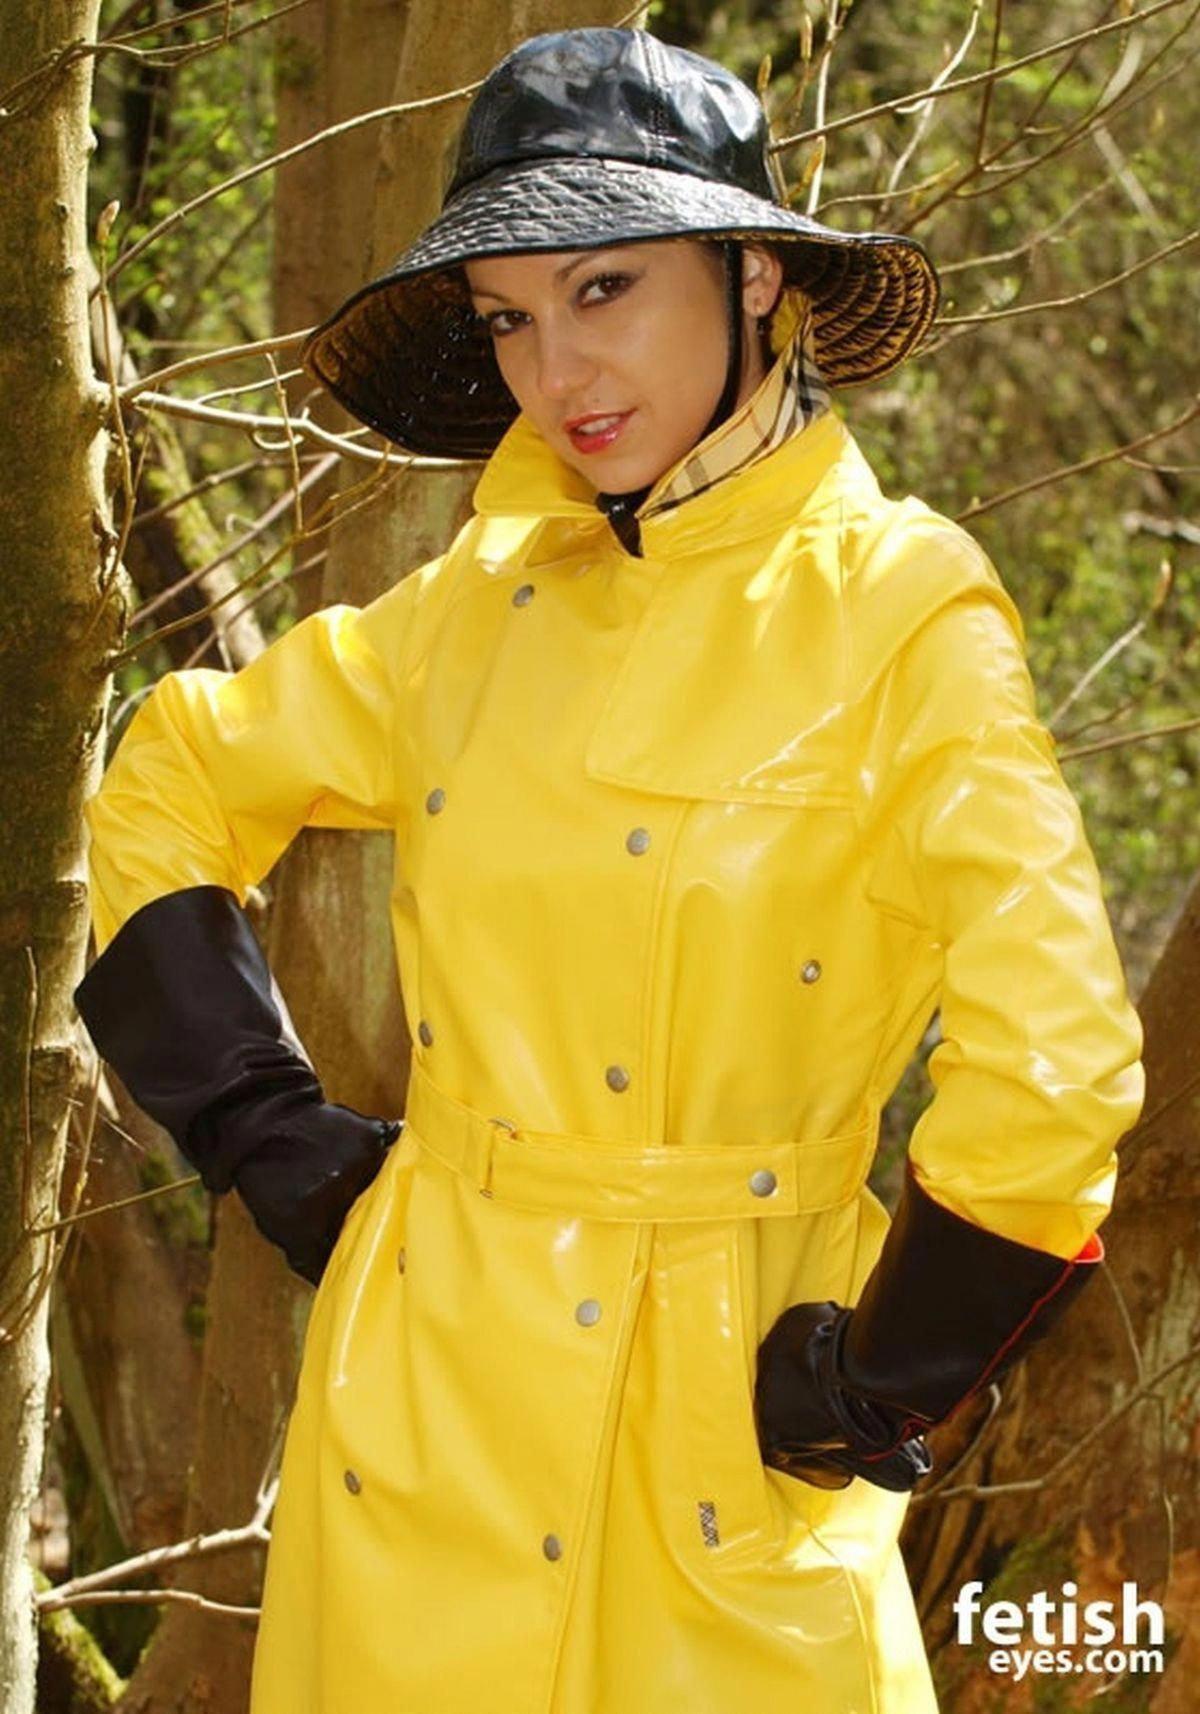 Alicia in red Vinyl 2 | Raincoats for women, Rainwear